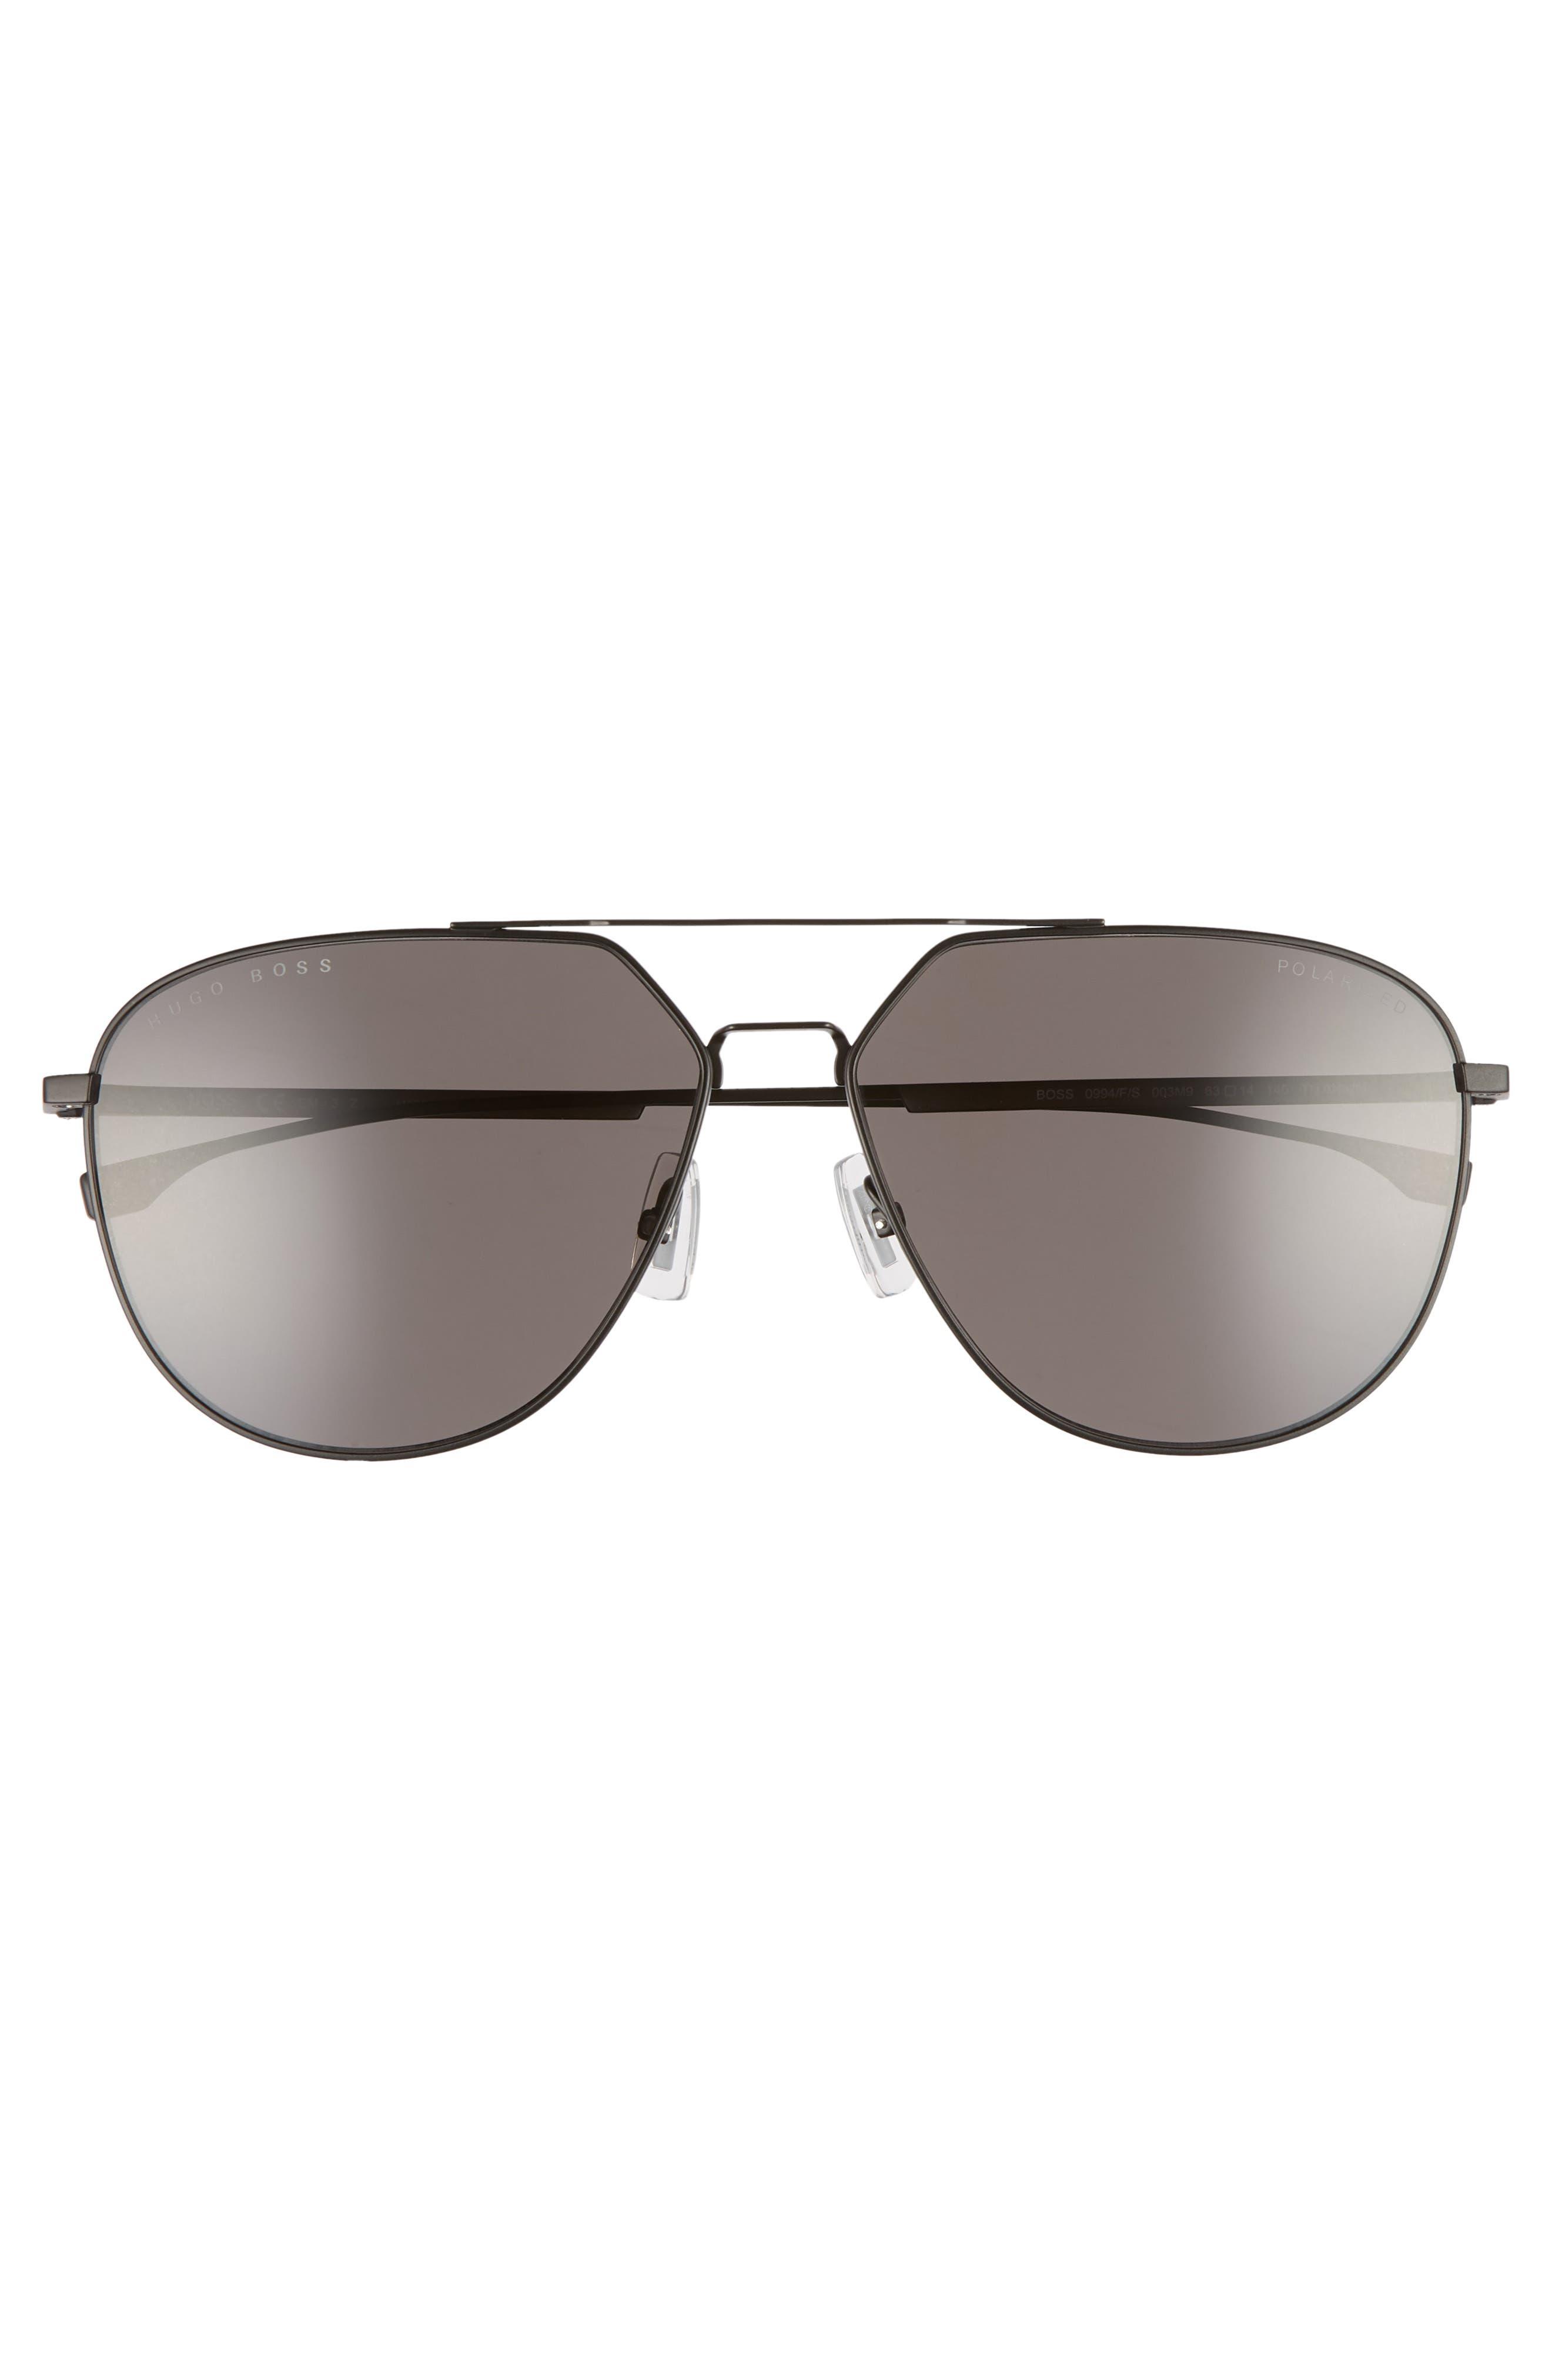 63mm Polarized Aviator Sunglasses,                             Alternate thumbnail 2, color,                             Matte Black